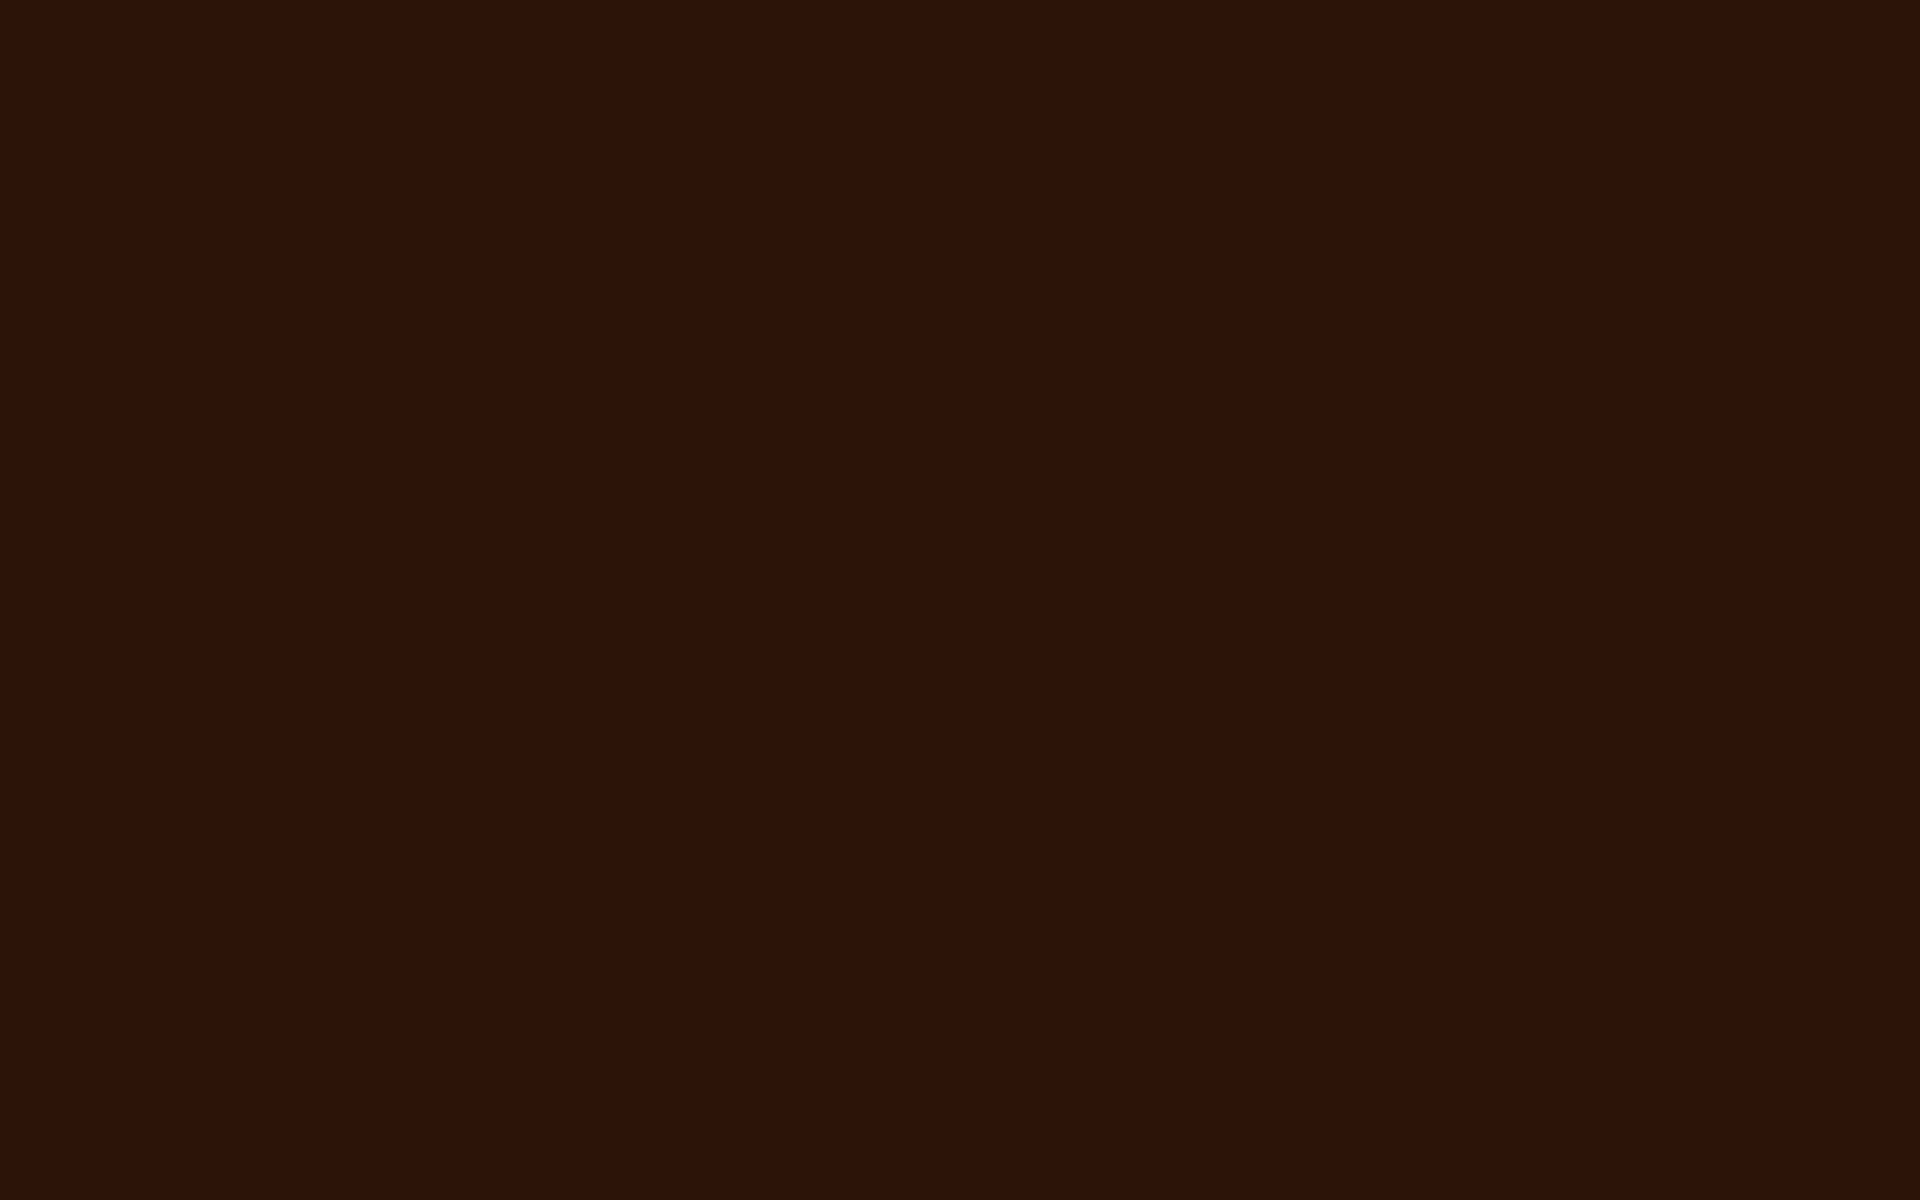 1920x1200 Zinnwaldite Brown Solid Color Background